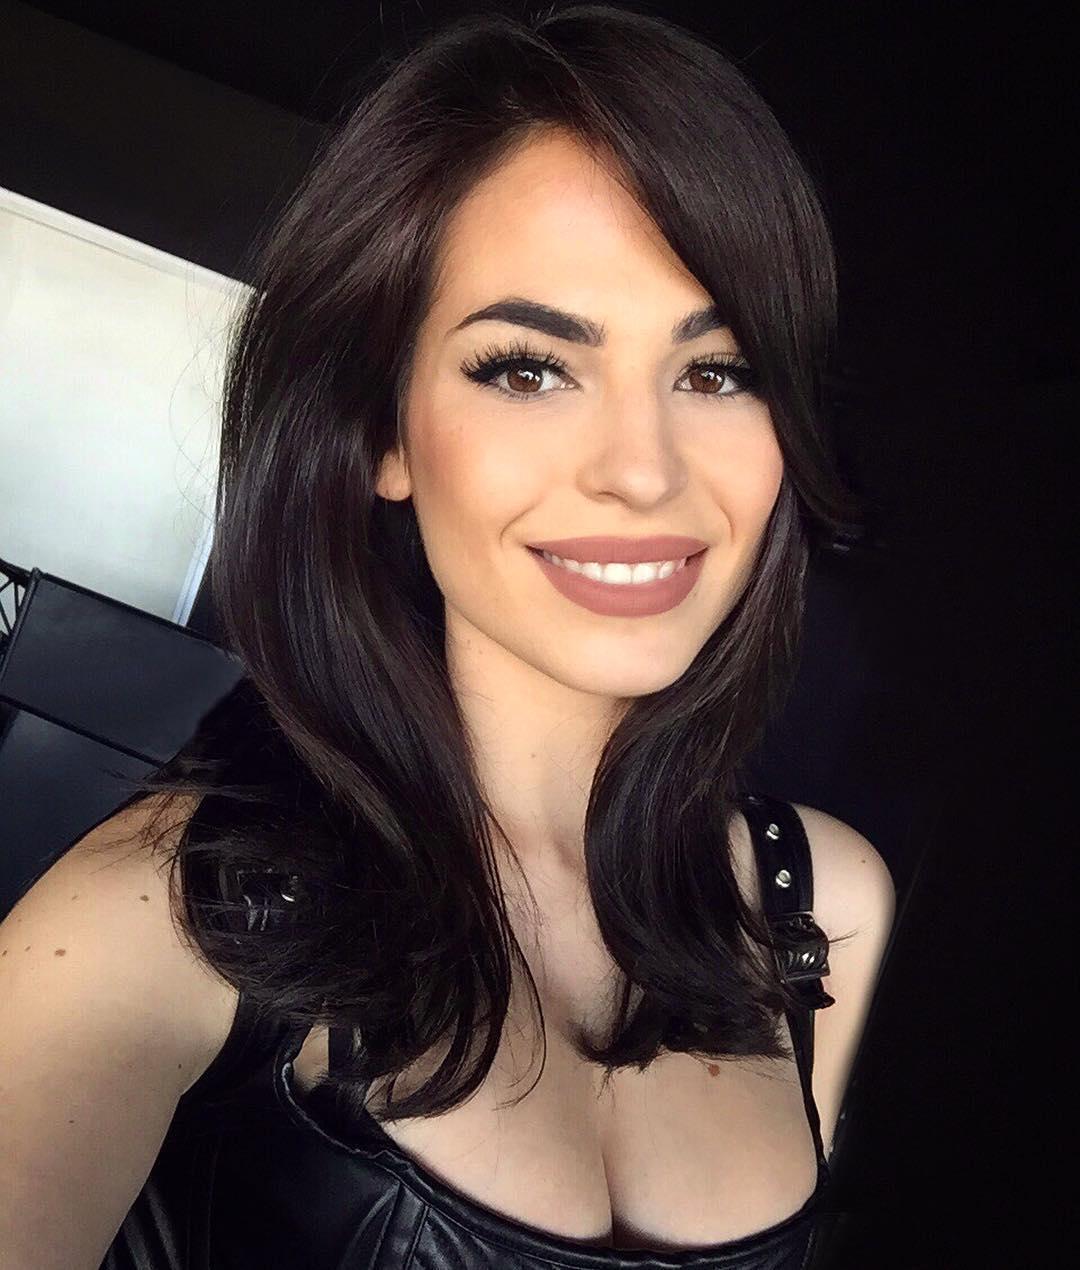 The most beautiful Spanish girls | Pretty girls